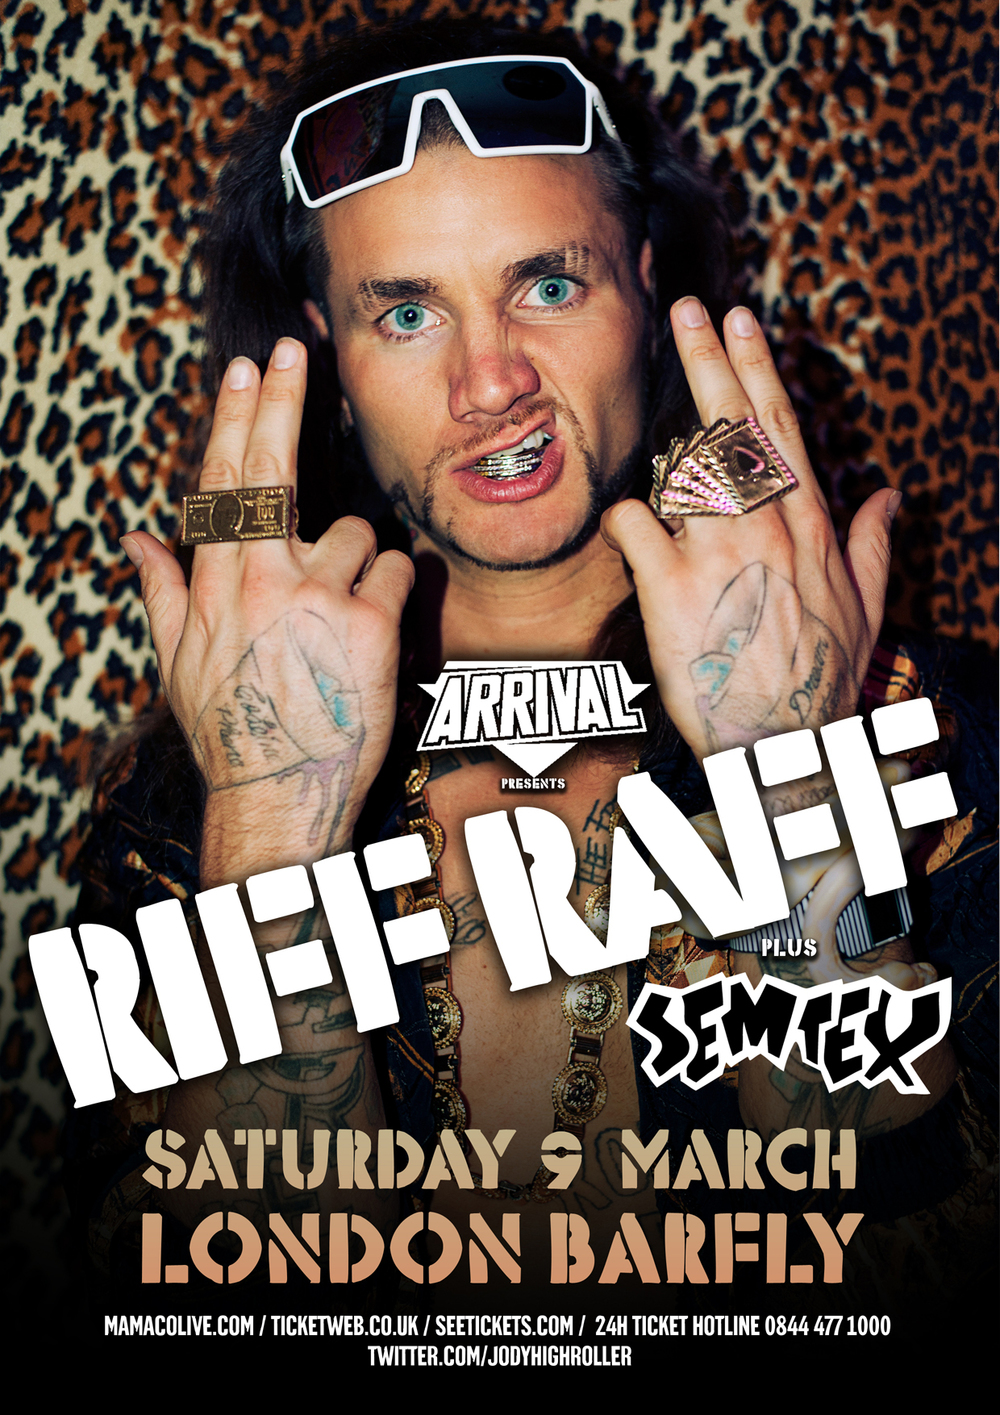 RiffRaff_poster copy 2.jpg